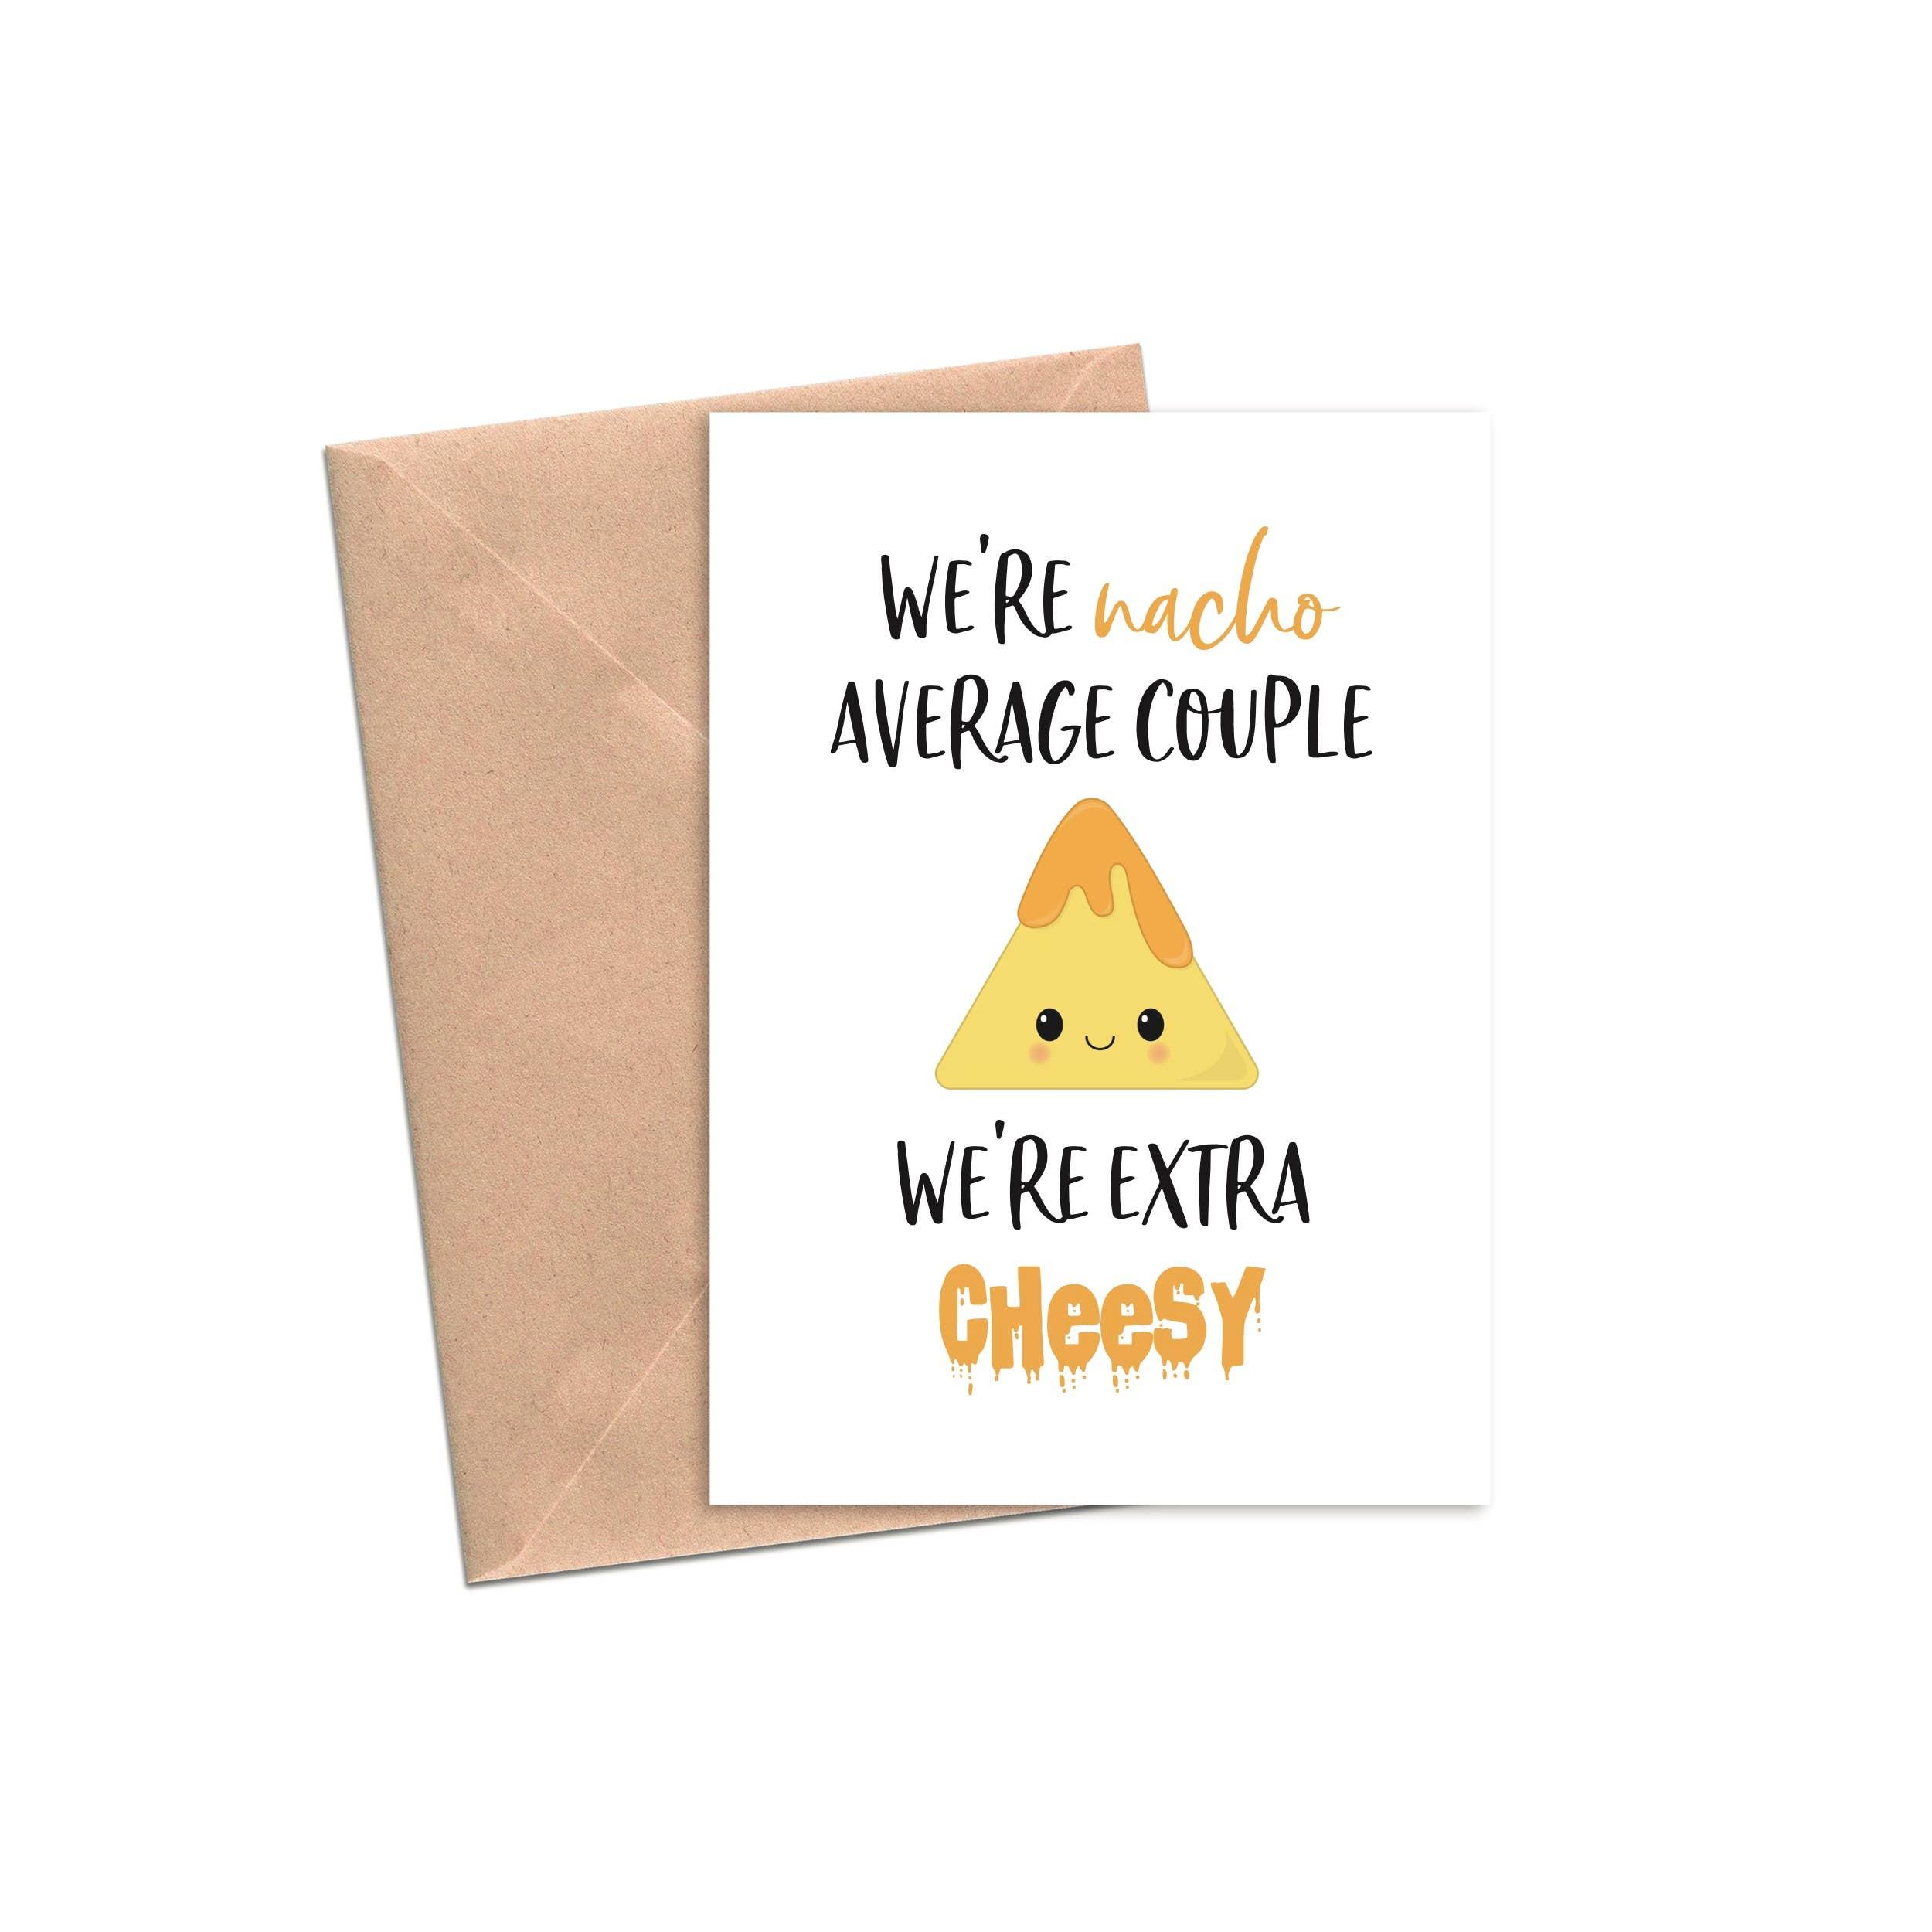 Nacho Average Couple | A2 | Trada Marketplace